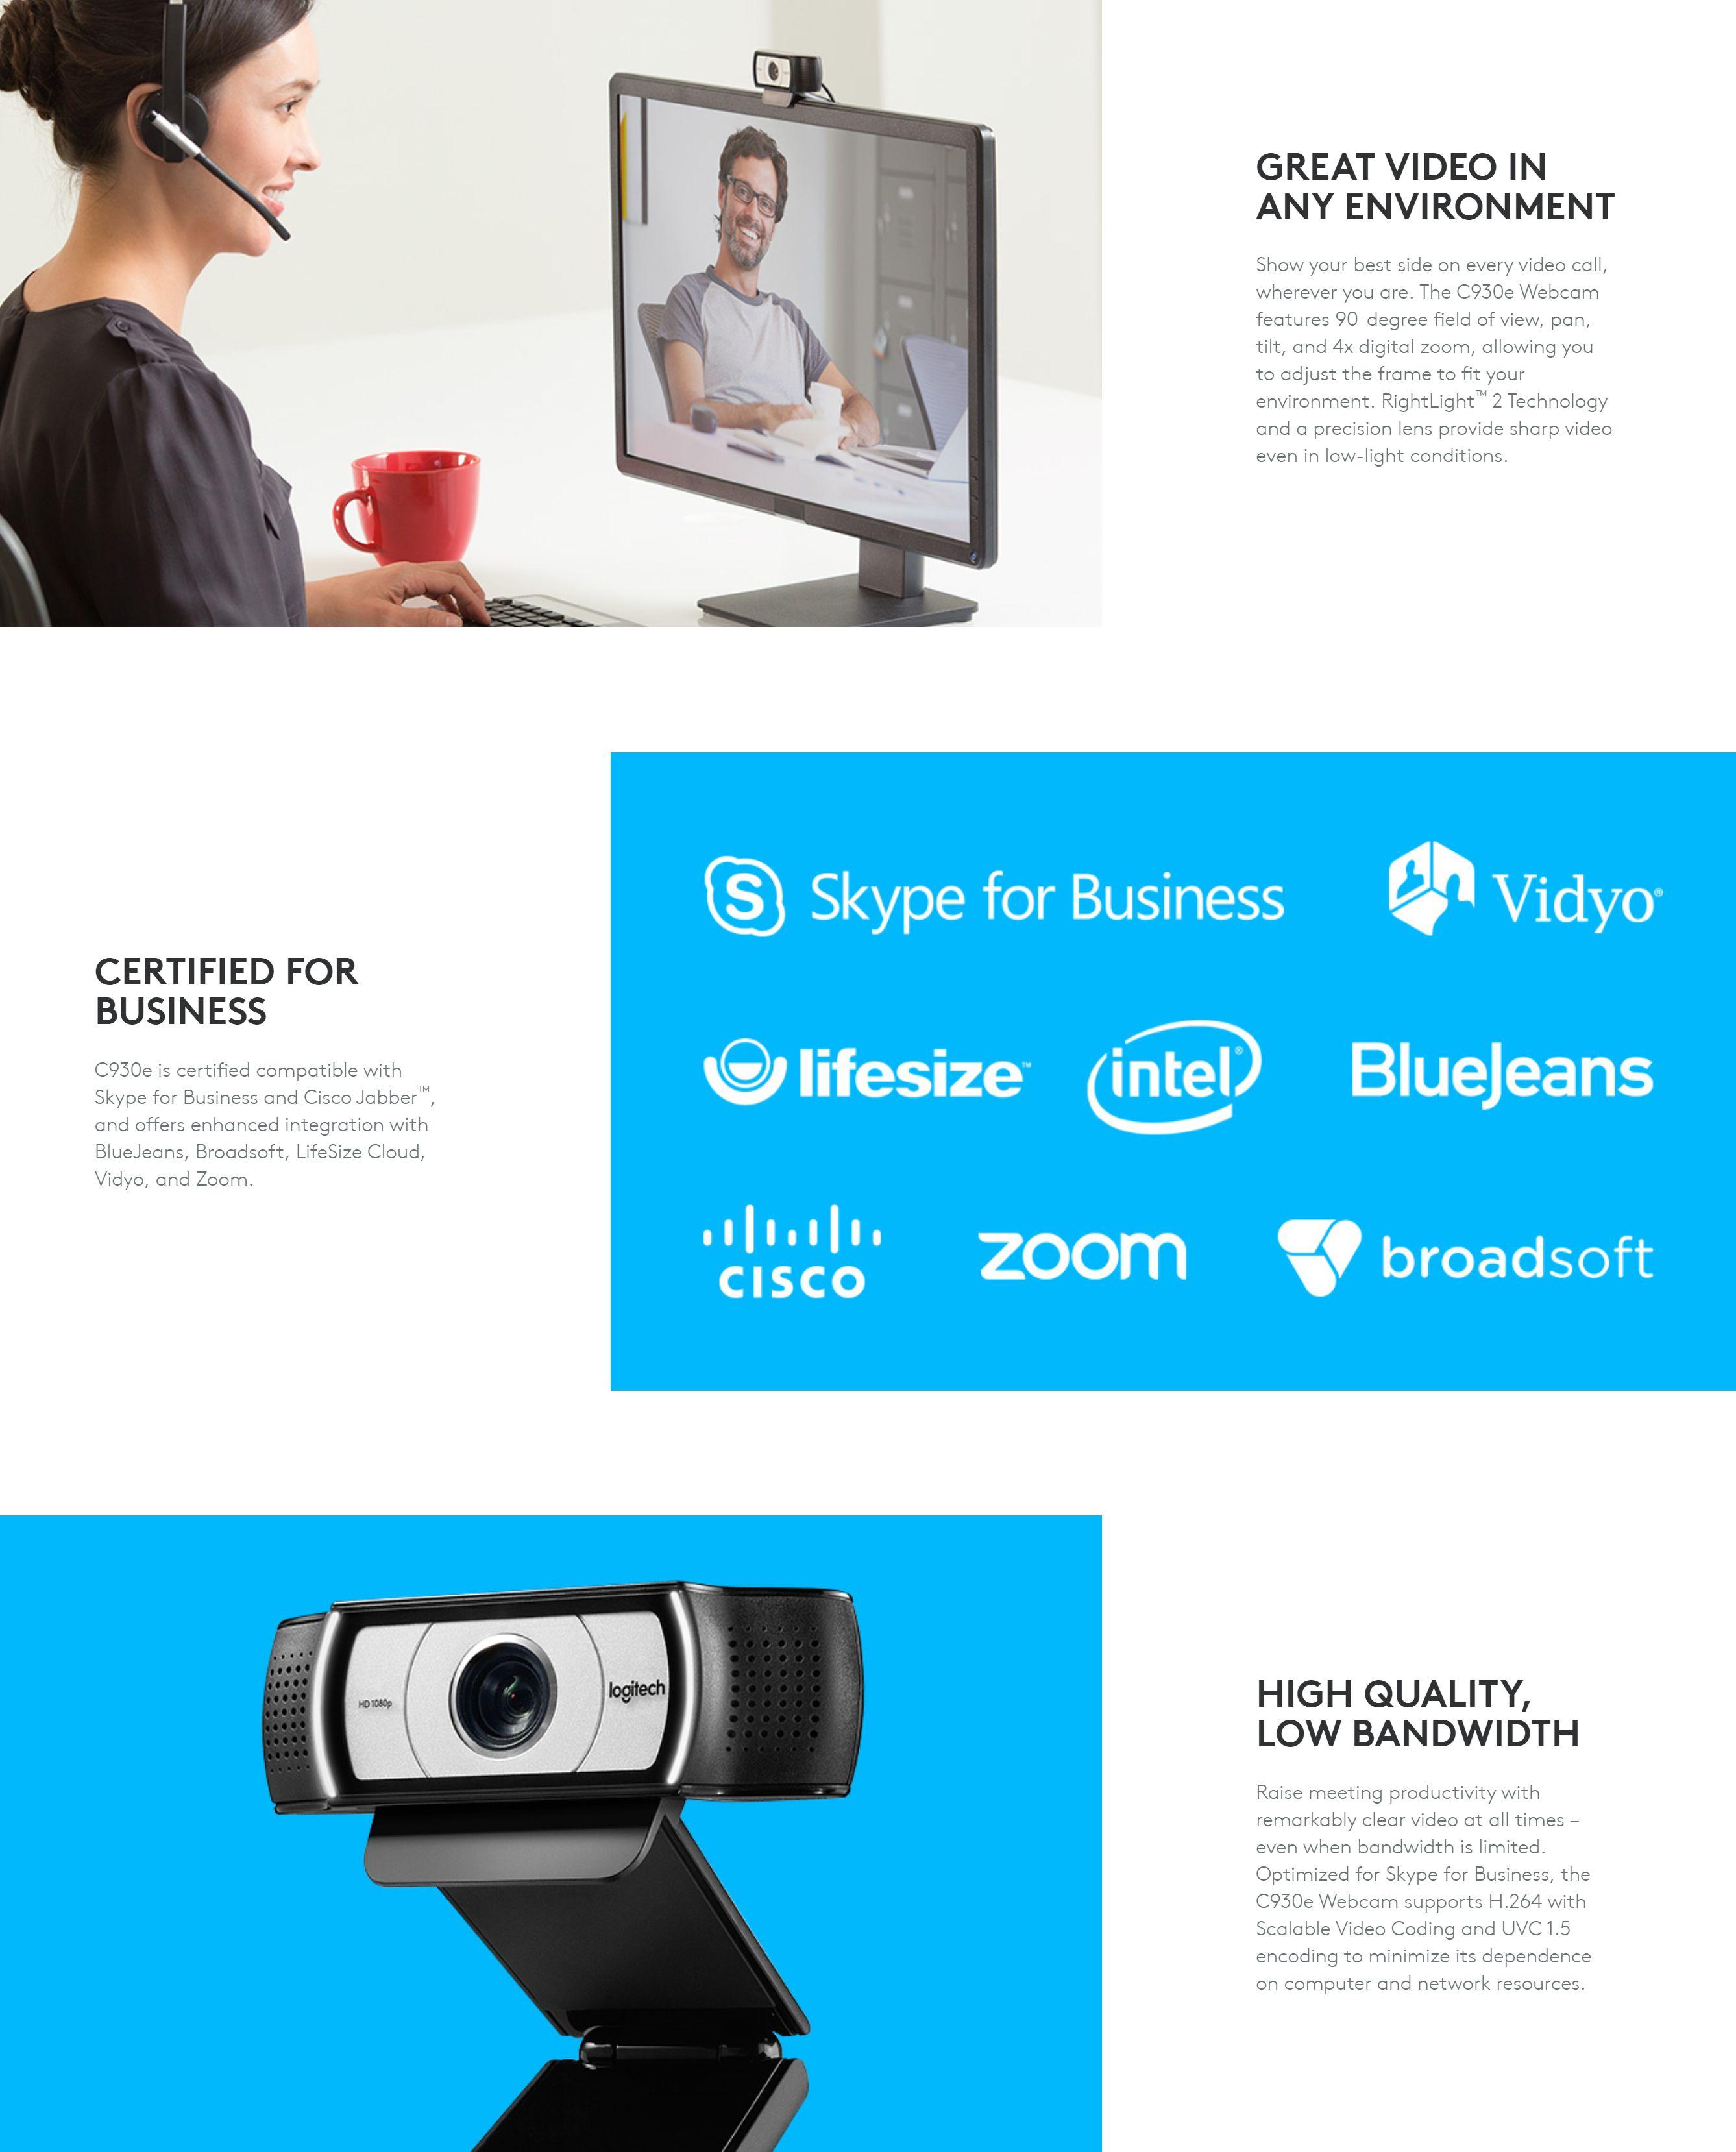 #1677 - 'Logitech C930e 1080p HD Webcam with H_264 Compression & Wide Field of View' - www_logitech_com.jpg